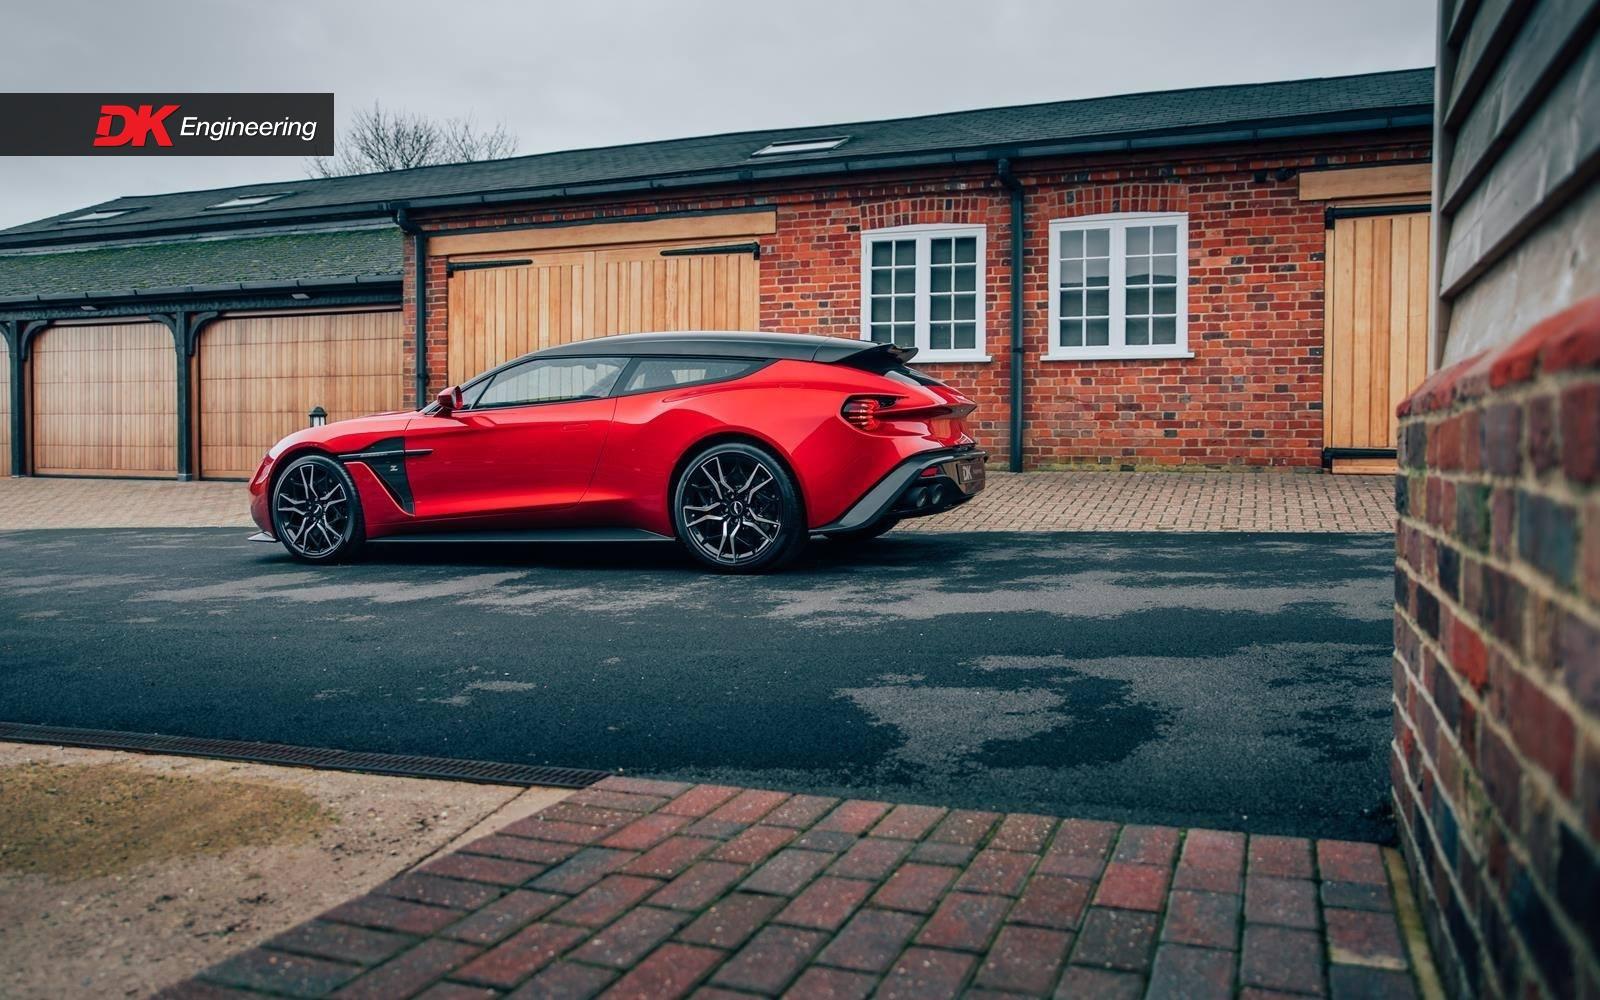 Aston Martin Vanquish Zagato Shooting Brake For Sale Vehicle Sales Dk Engineering